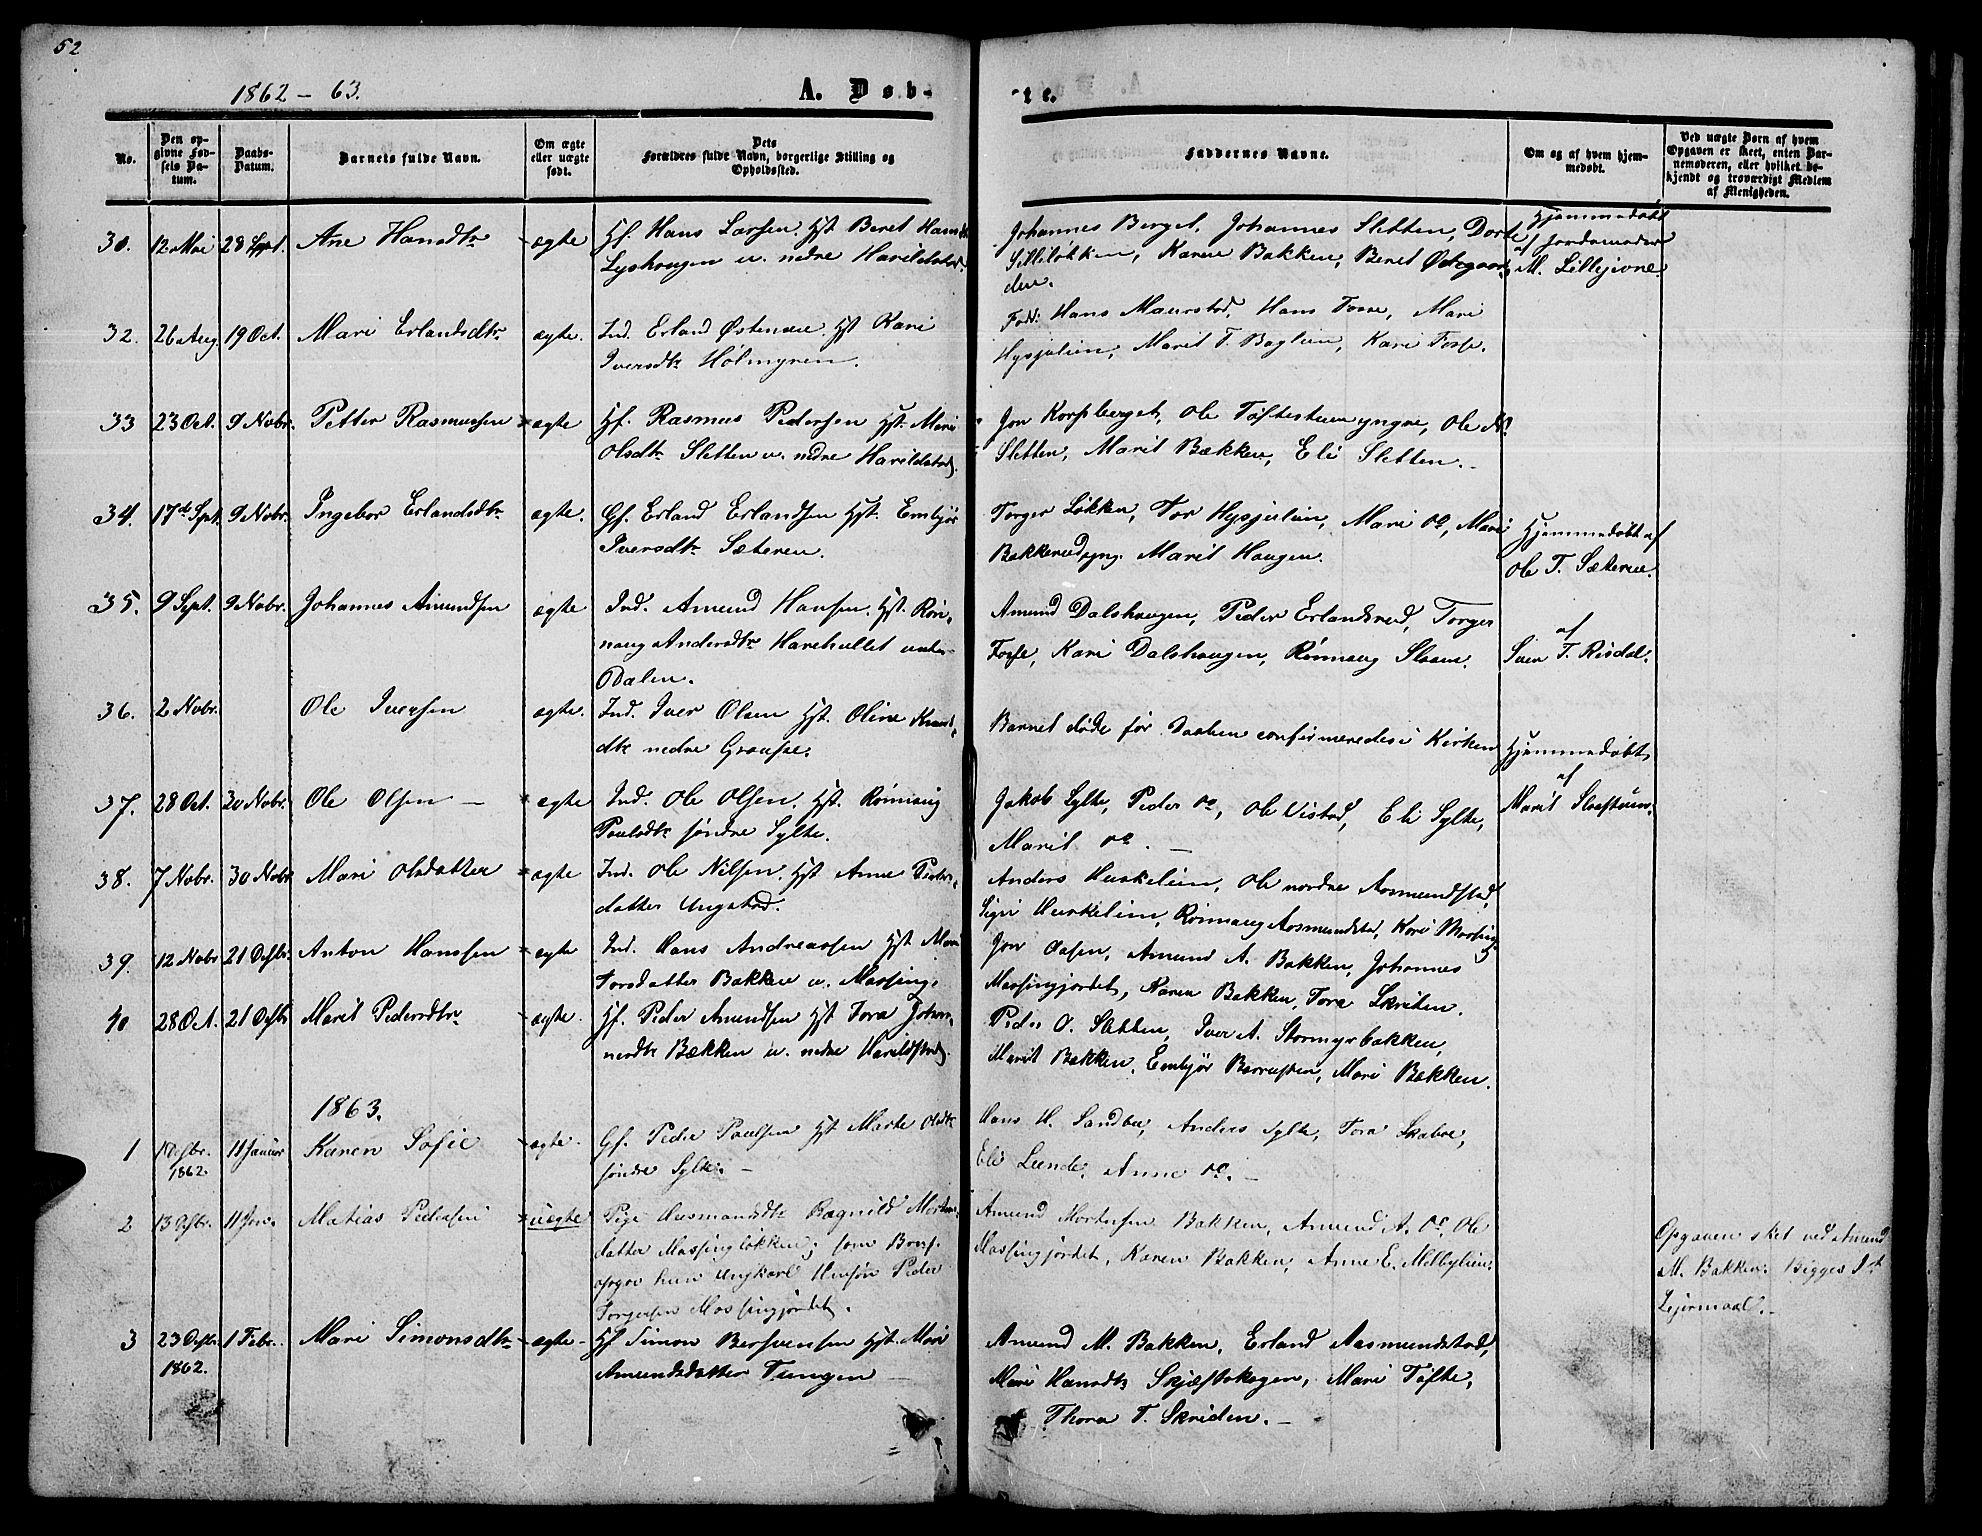 SAH, Nord-Fron prestekontor, Klokkerbok nr. 2, 1851-1883, s. 52